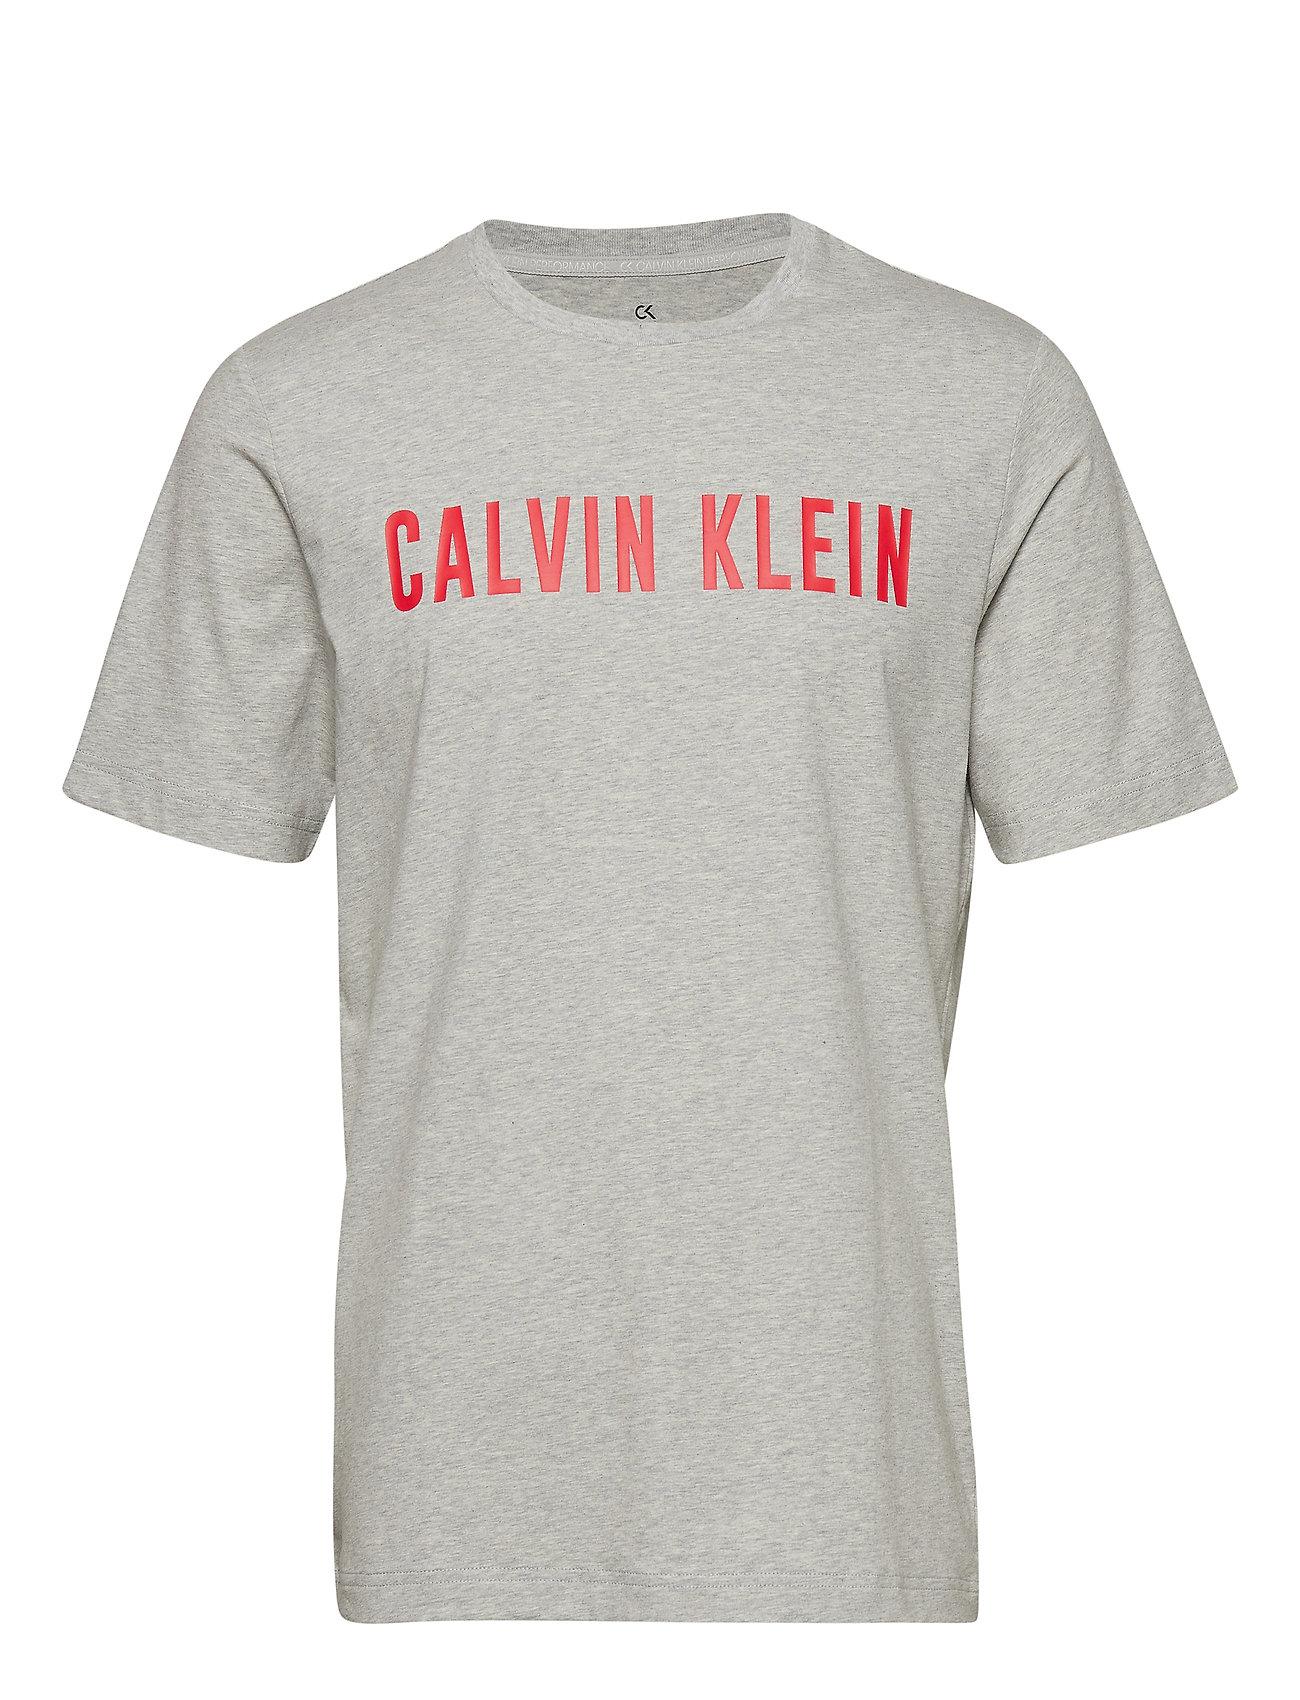 Calvin Klein Performance SHORT SLEEVE T-SHIRT - LT GREY HTR/HIGH RISK RED